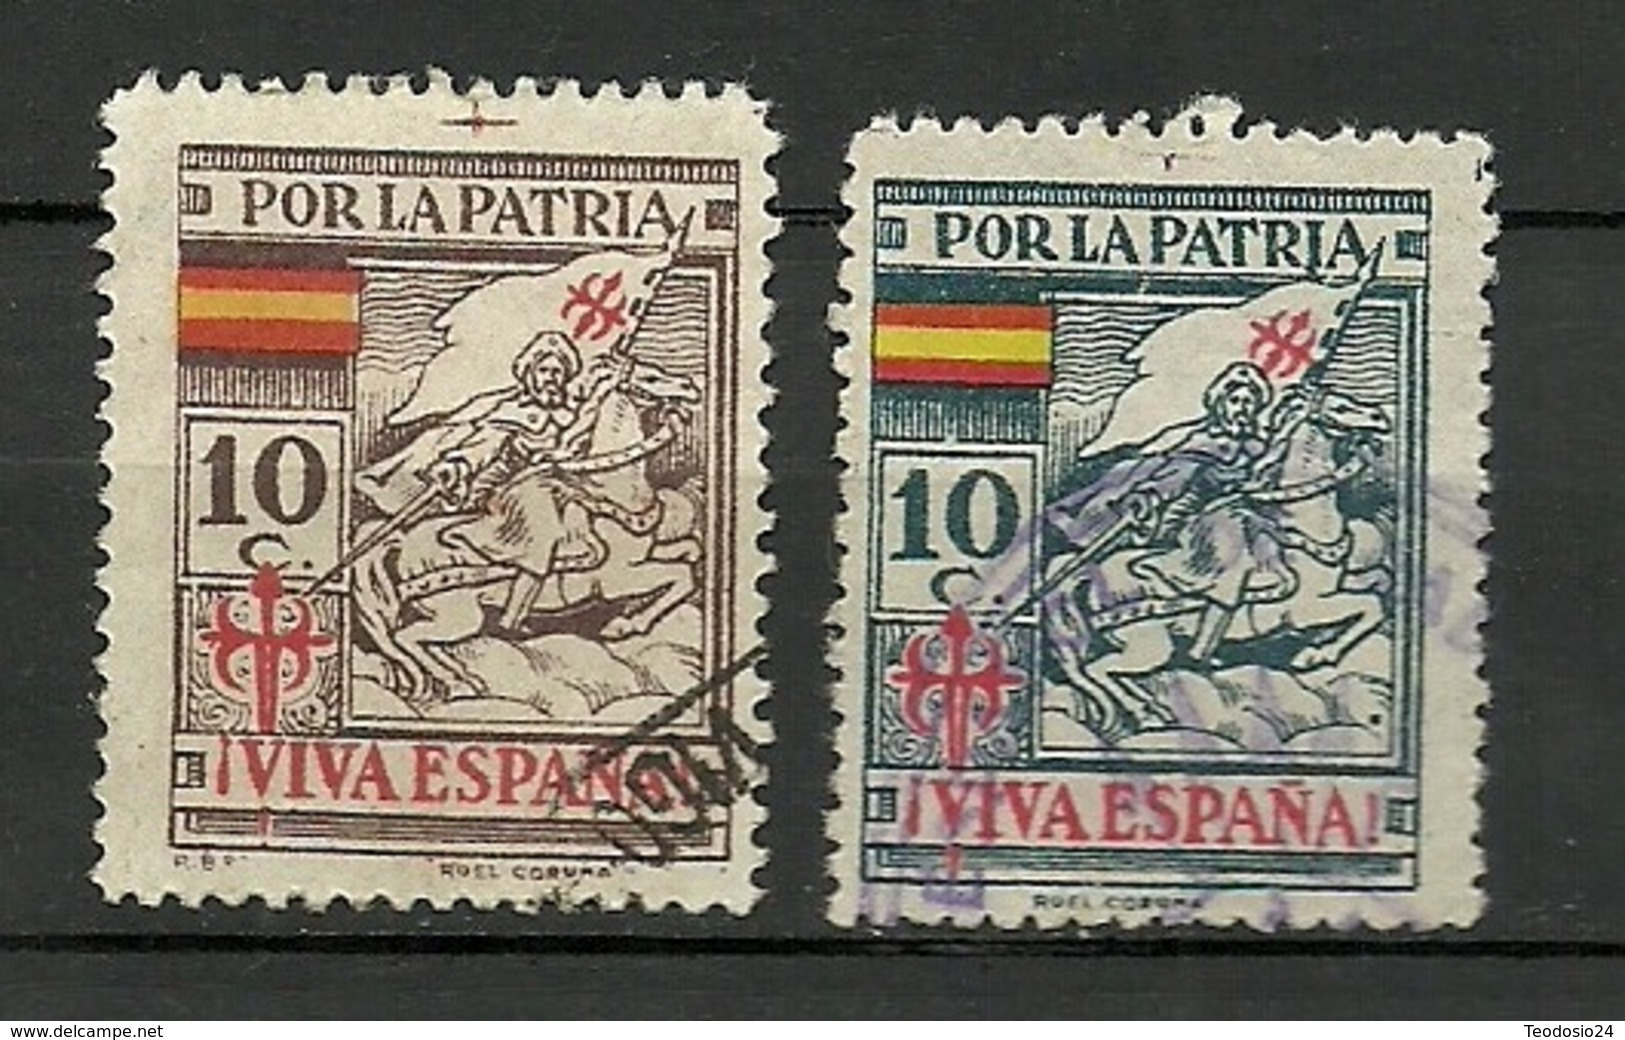 SANTIAGO APOSTOL POR LA PATRIA - Viñetas De La Guerra Civil